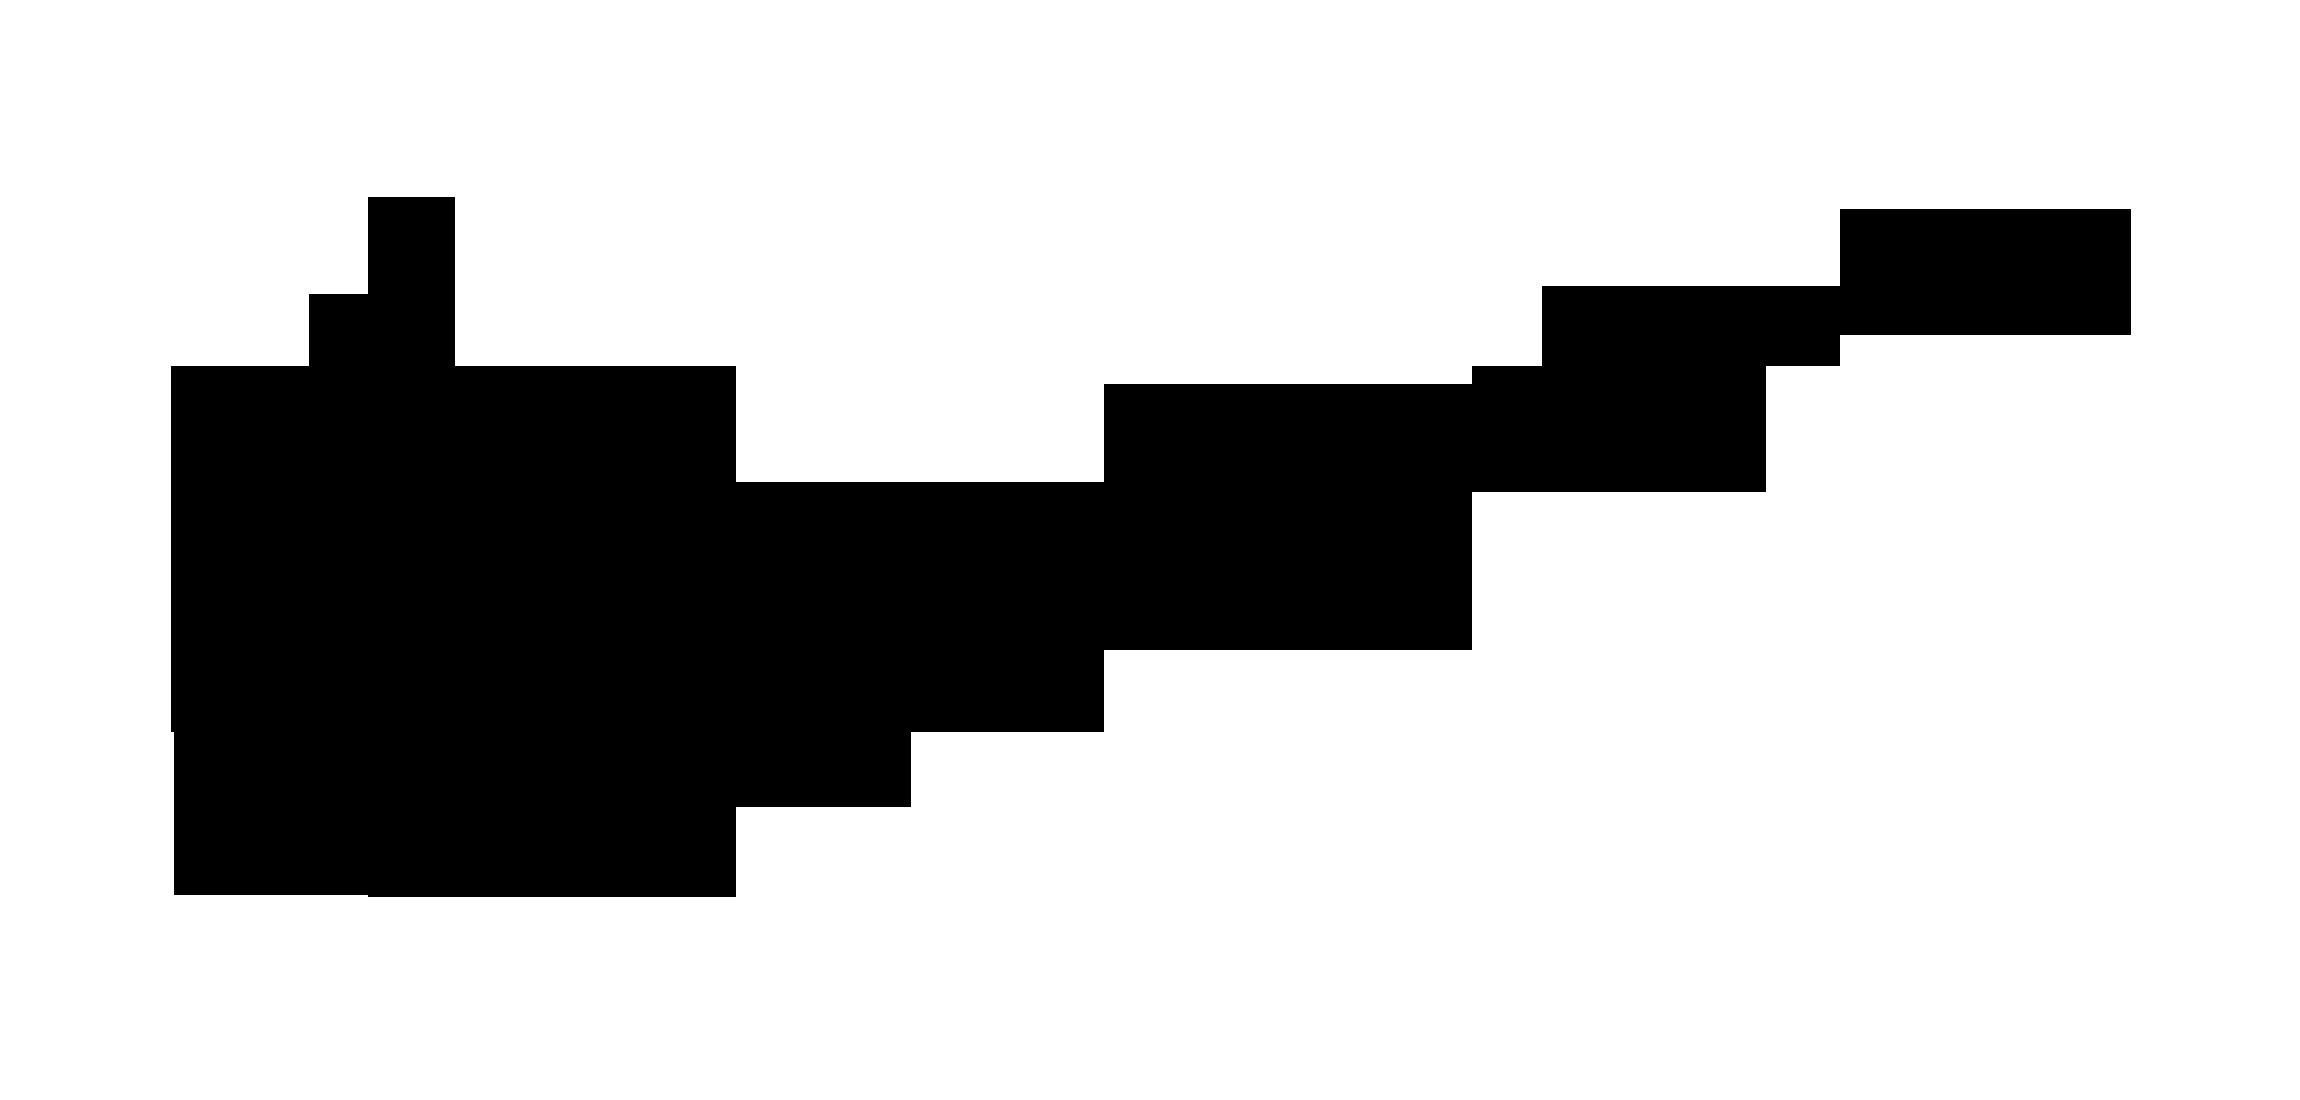 Black Nike Icon on white background